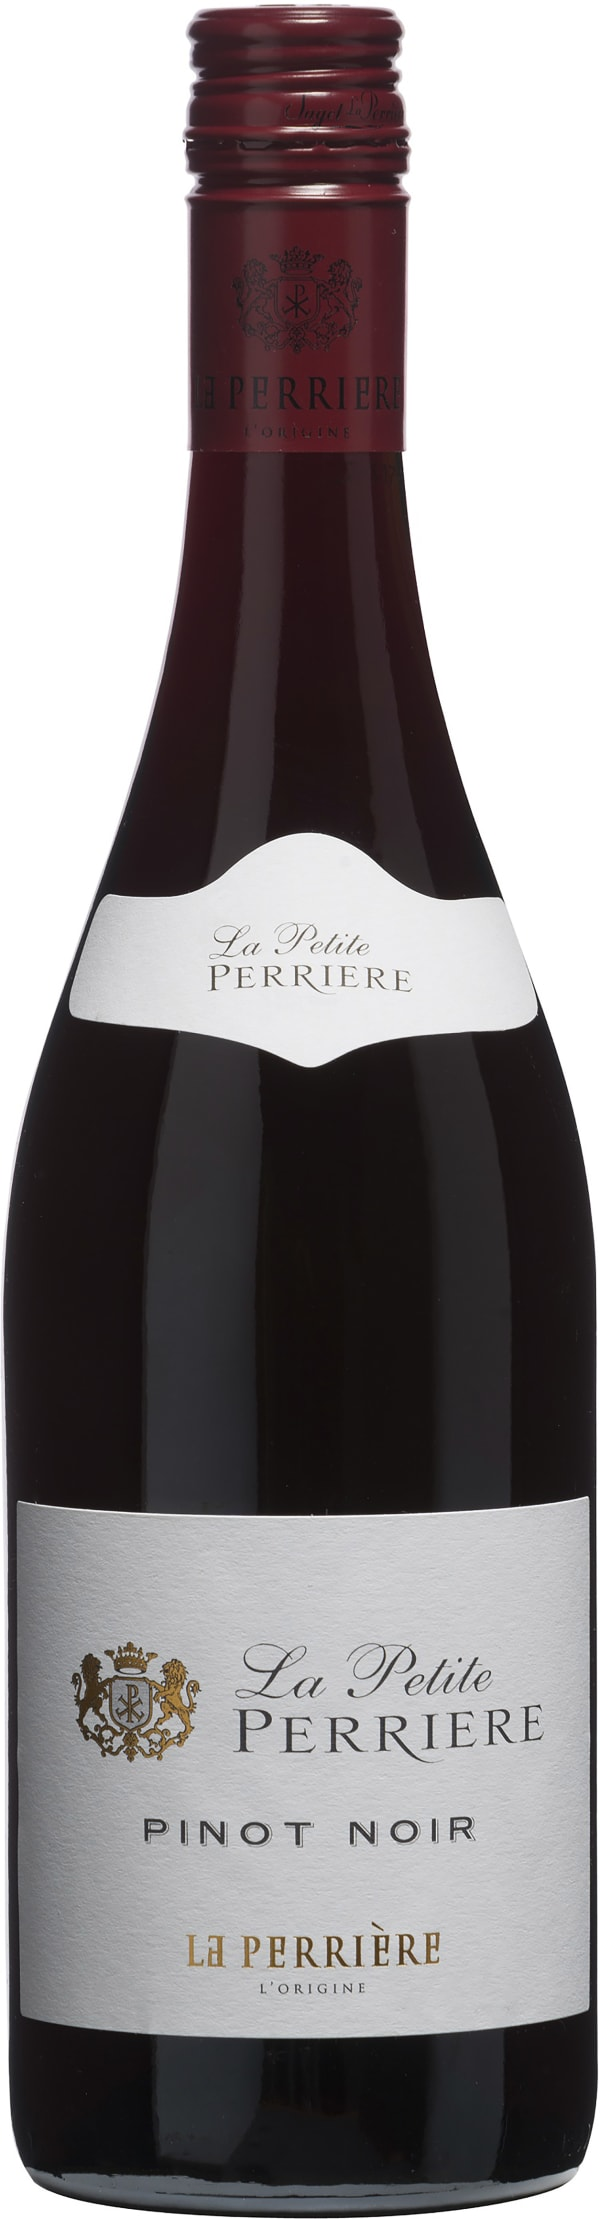 La Petite Perriere Pinot Noir 2015